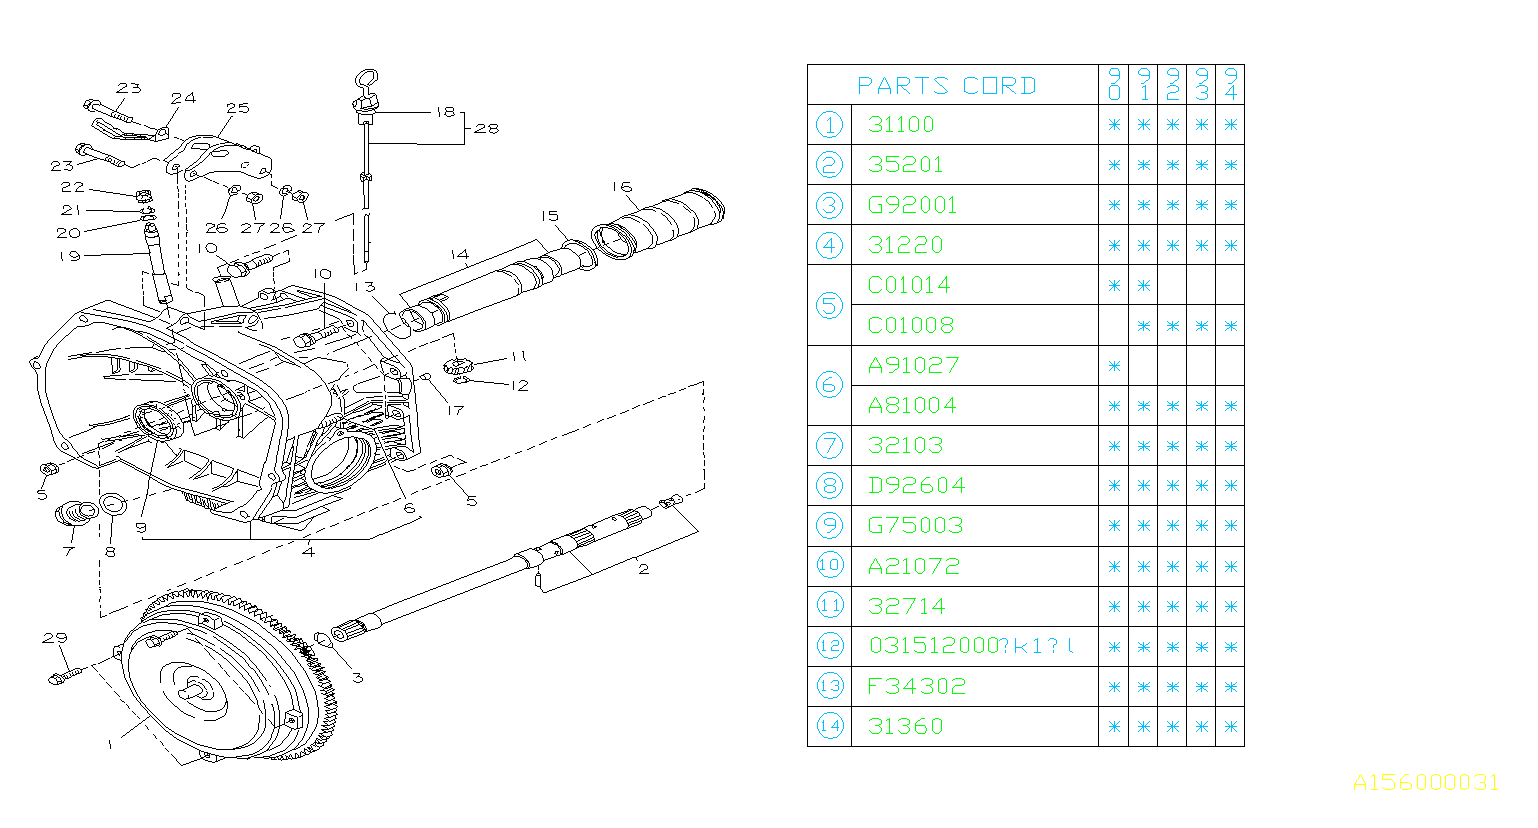 806750050 - Automatic Transmission Oil Pump Seal -m   744050  Converter  Case  Torque